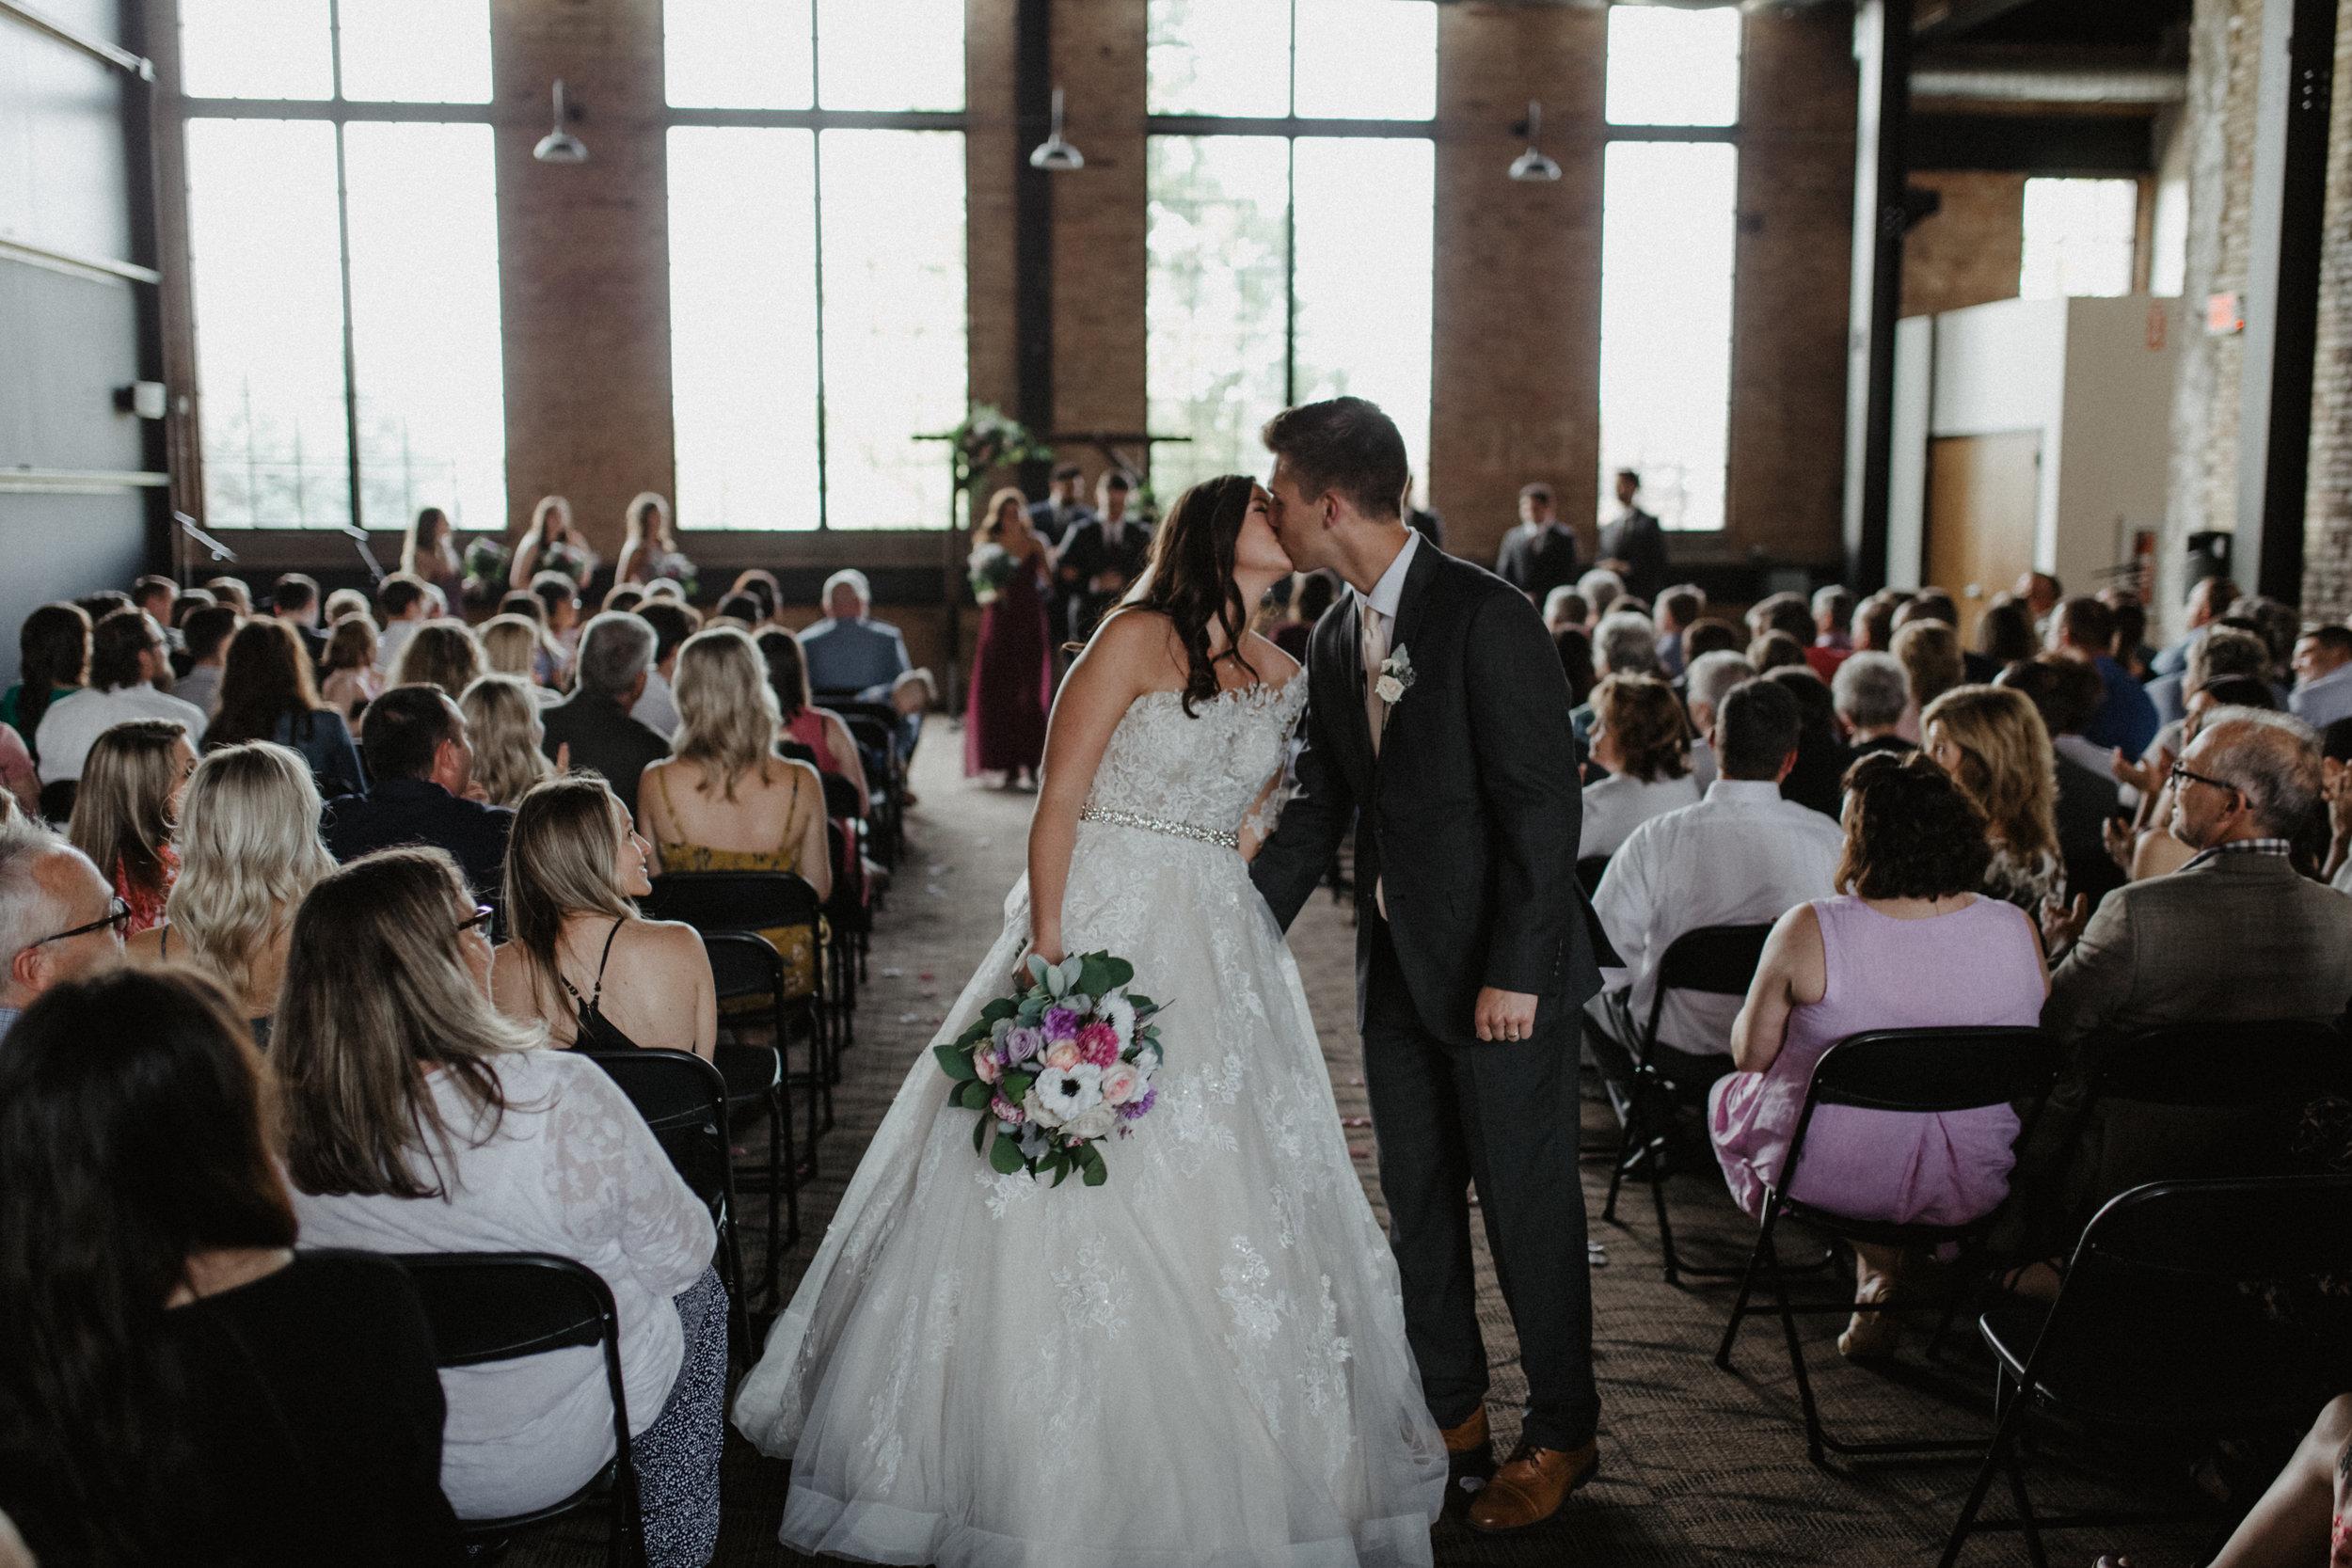 GRAYCENTOMHAMILTON-GRAND-RAPIDS-WEDDING-PHOTOGRAPHY-51.jpg